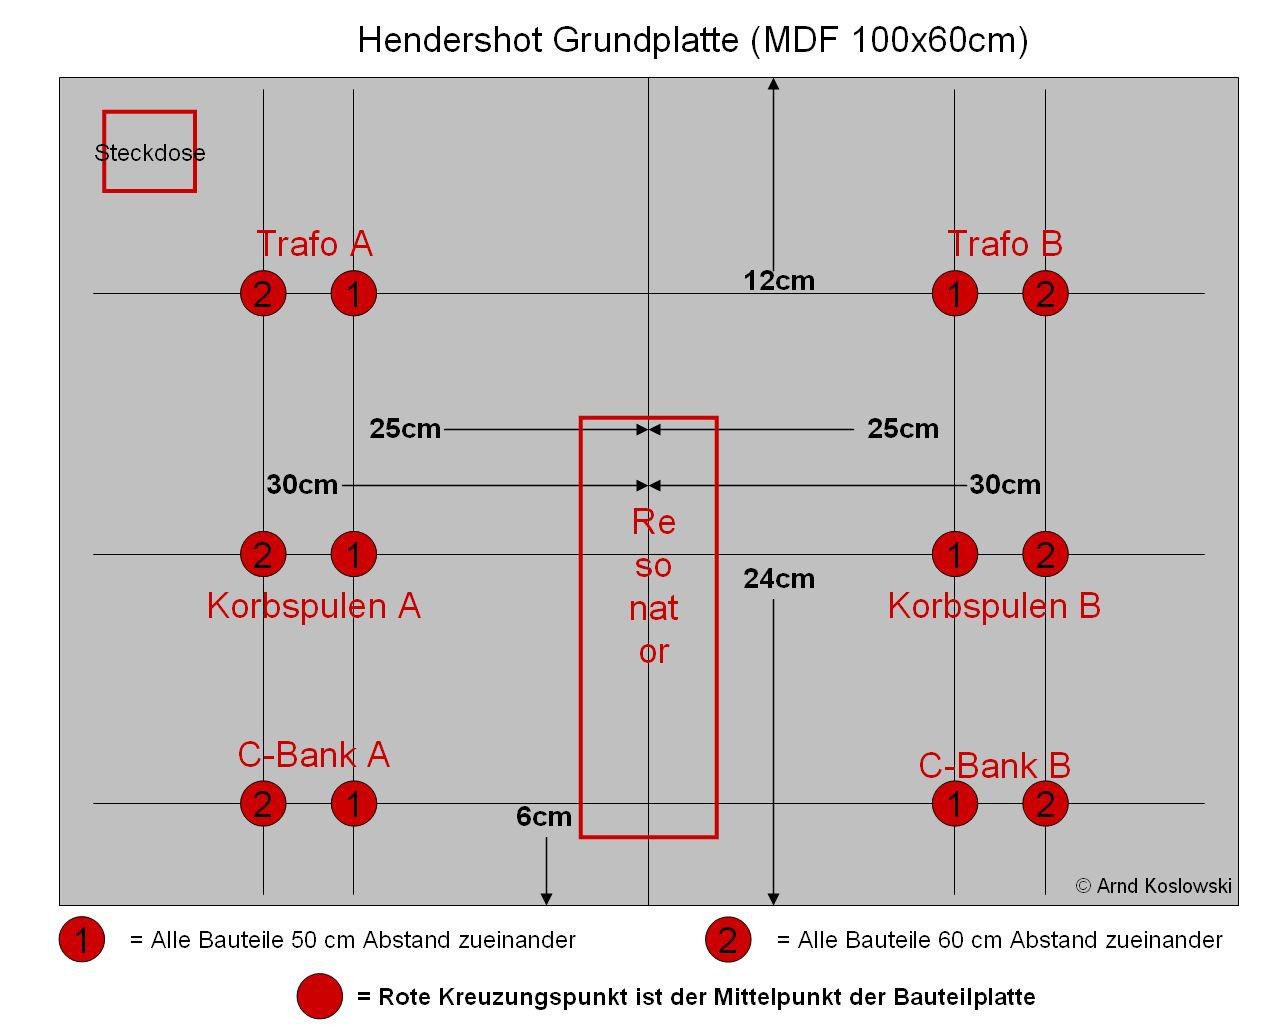 Hendershot Grundplatte - Maßangaben